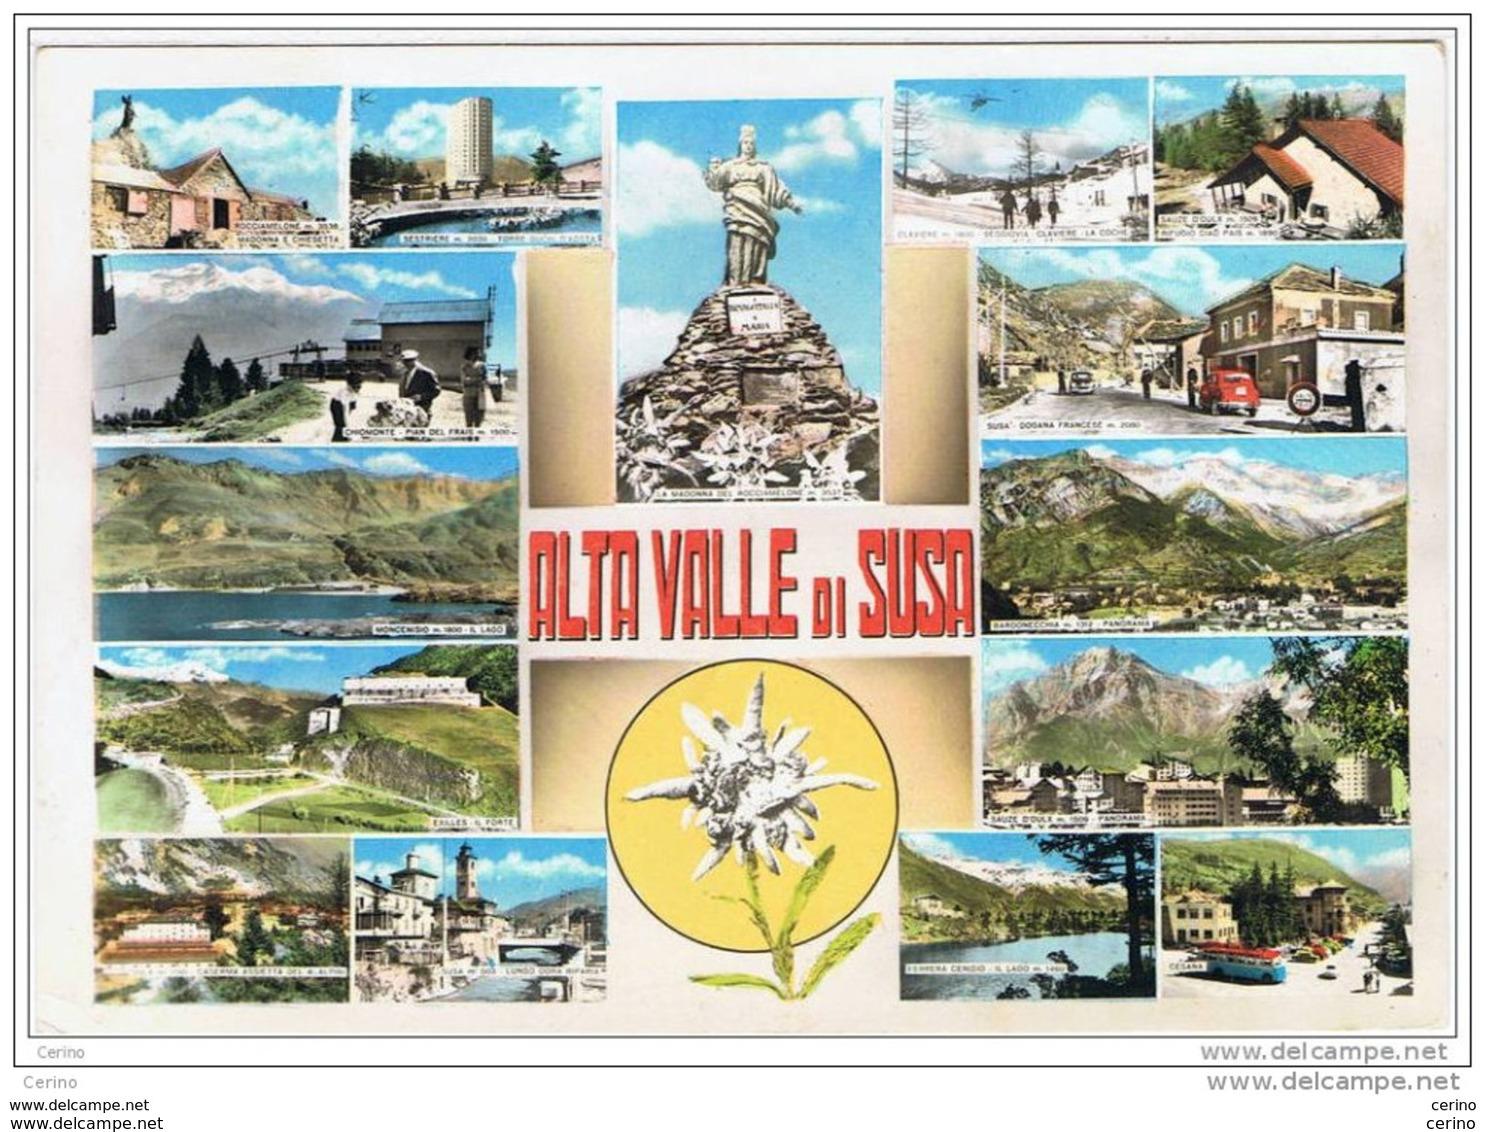 ALTA  VALLE  DI  SUSA (TO):  VEDUTINE  -  FOTO  BROMOCOLOR  -  FG - Italia